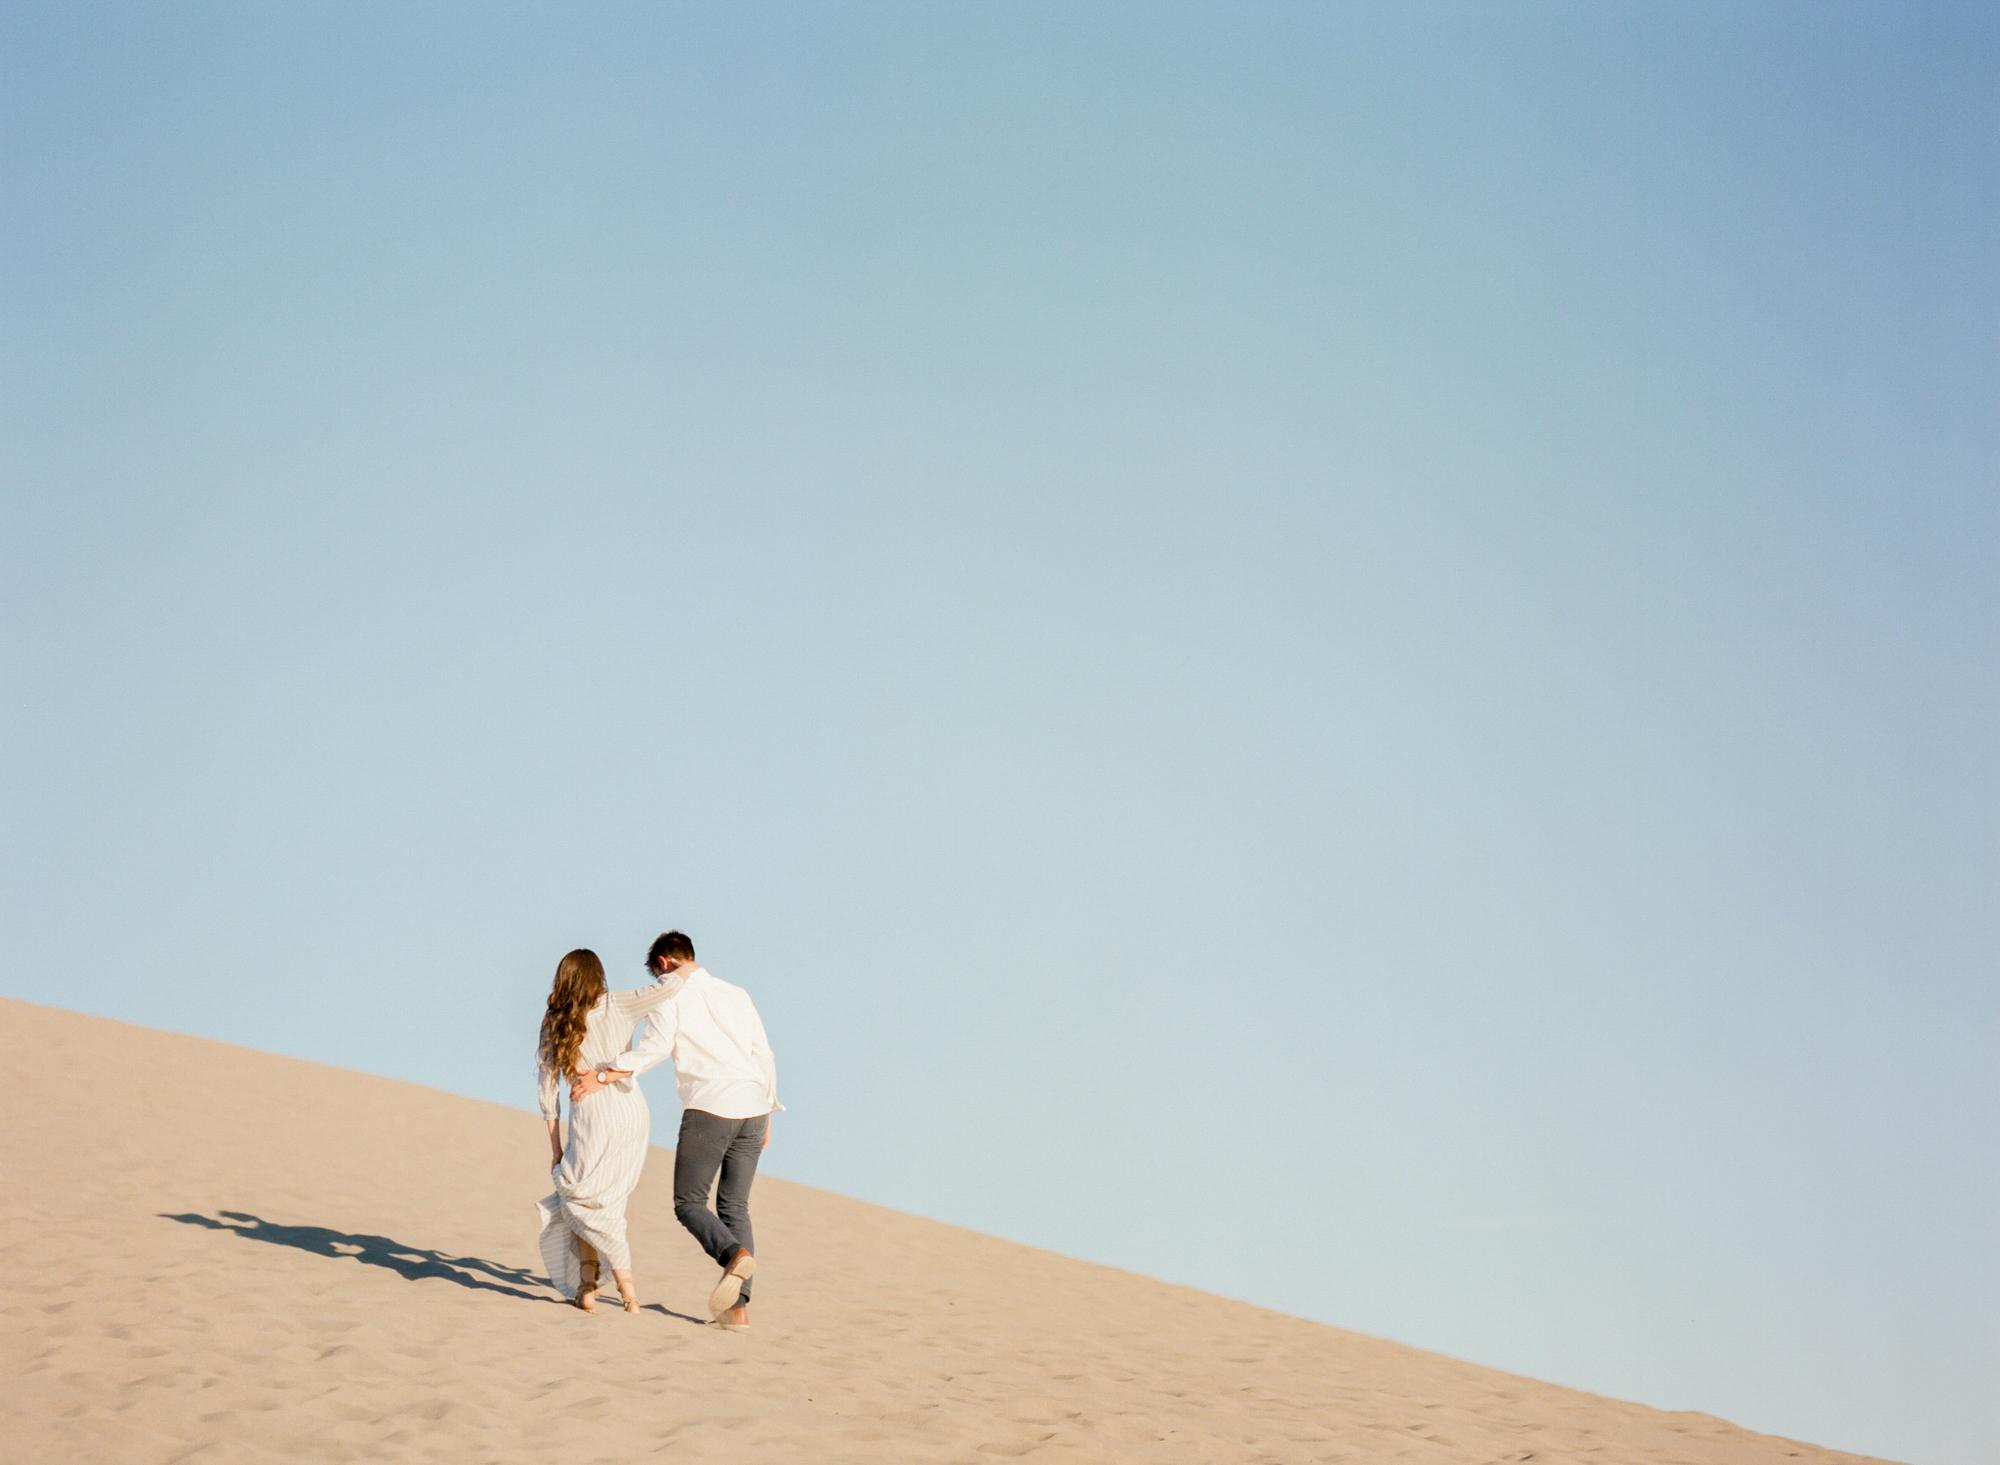 charlotte-charleston-wedding-family-film-destination-photographer-bruneau-sand-dunes-boise-idaho-16.jpg